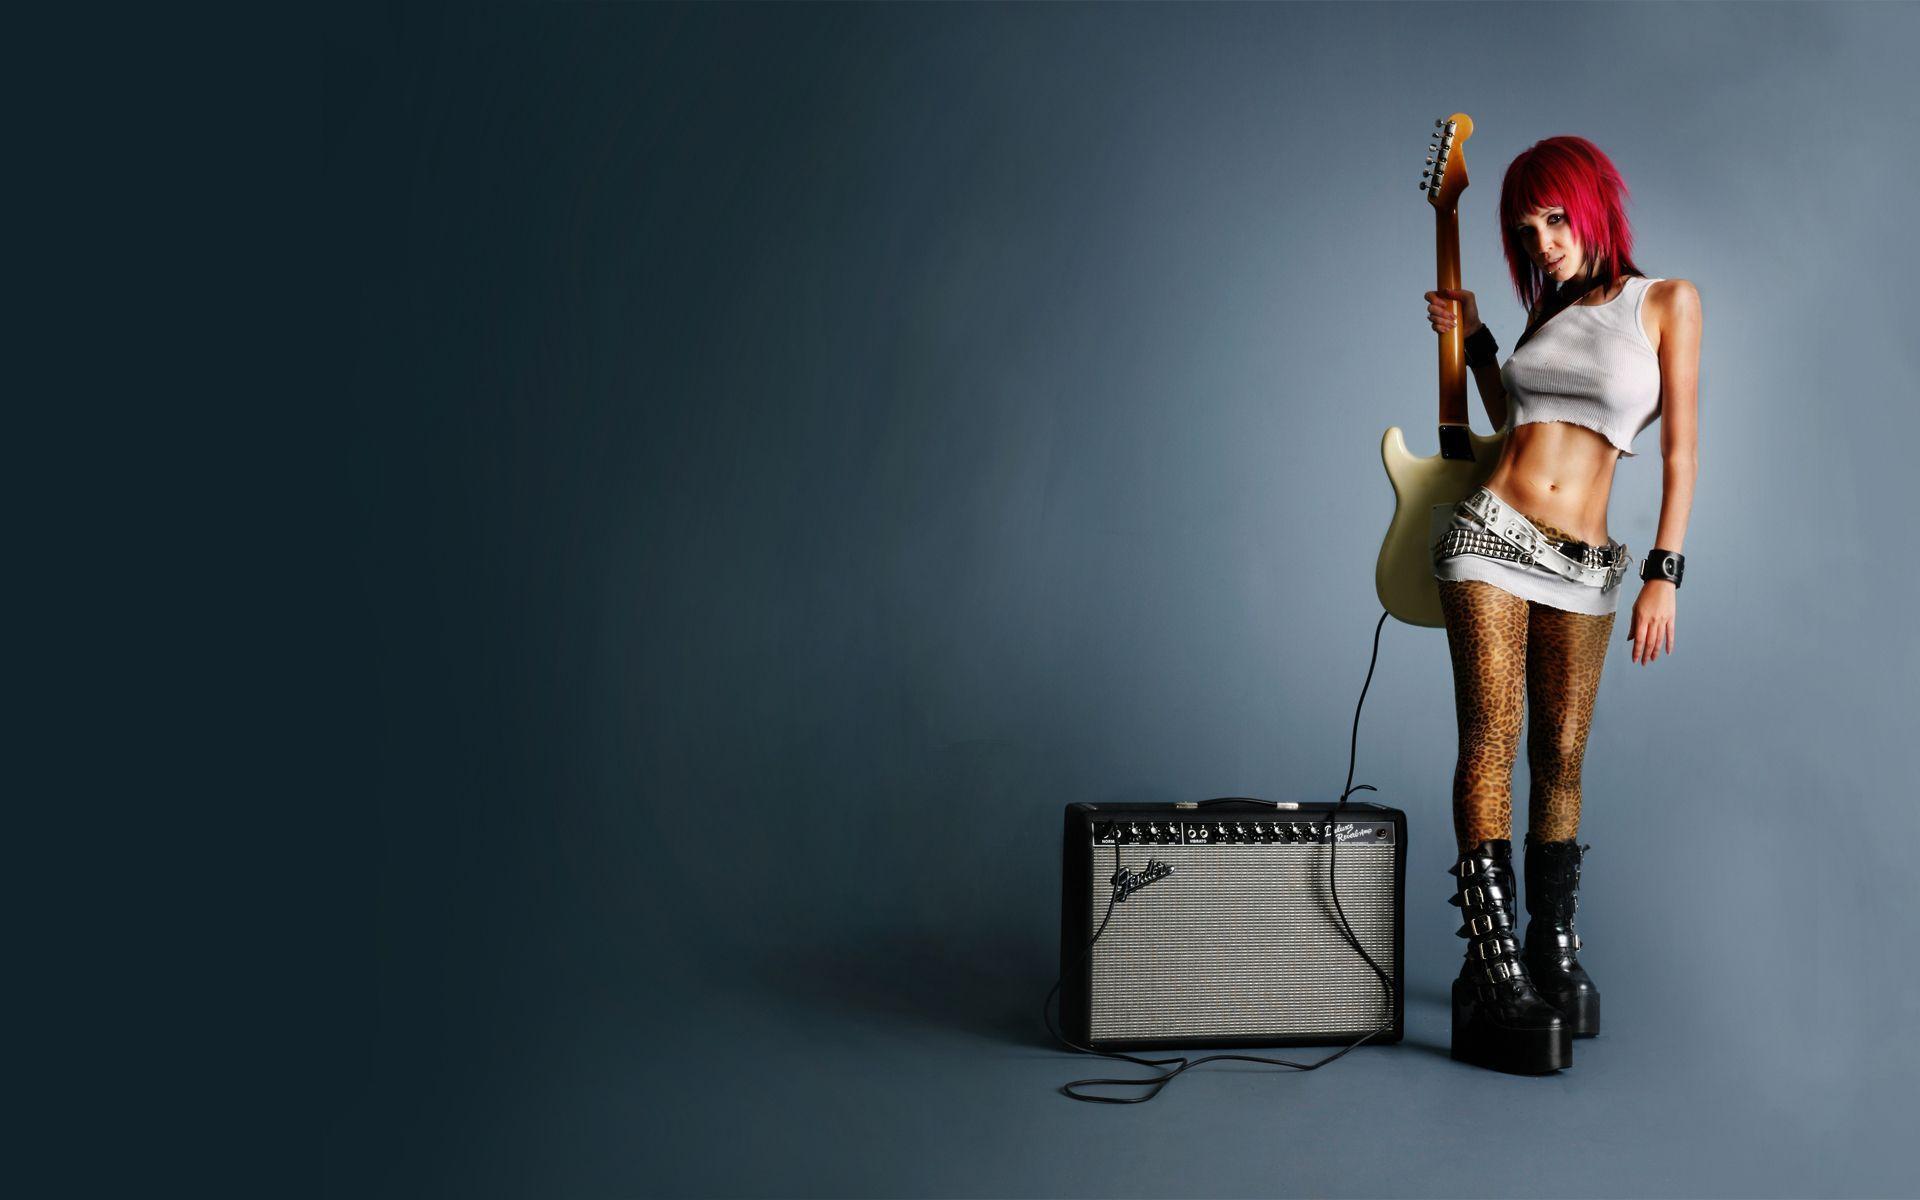 hard, rock, babe,Music, guitar, speakers wallpapers | Random cool ...